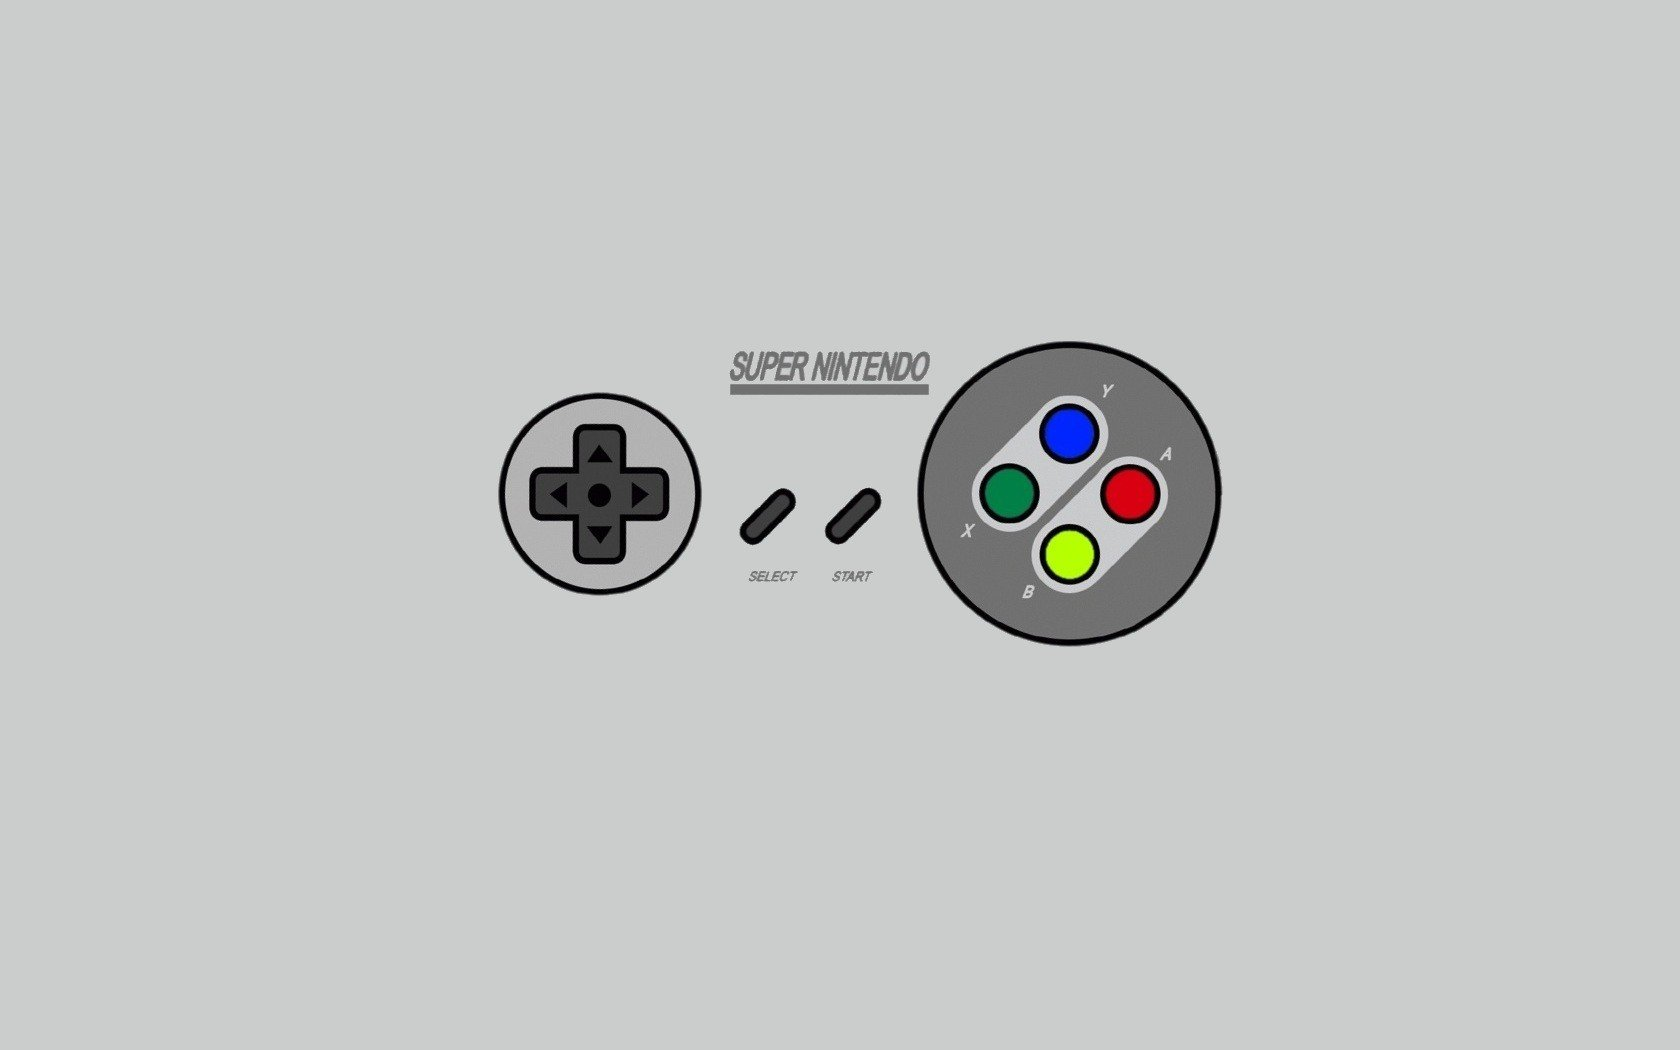 Nintendo Minimalistic Super Nintendo Simple Background